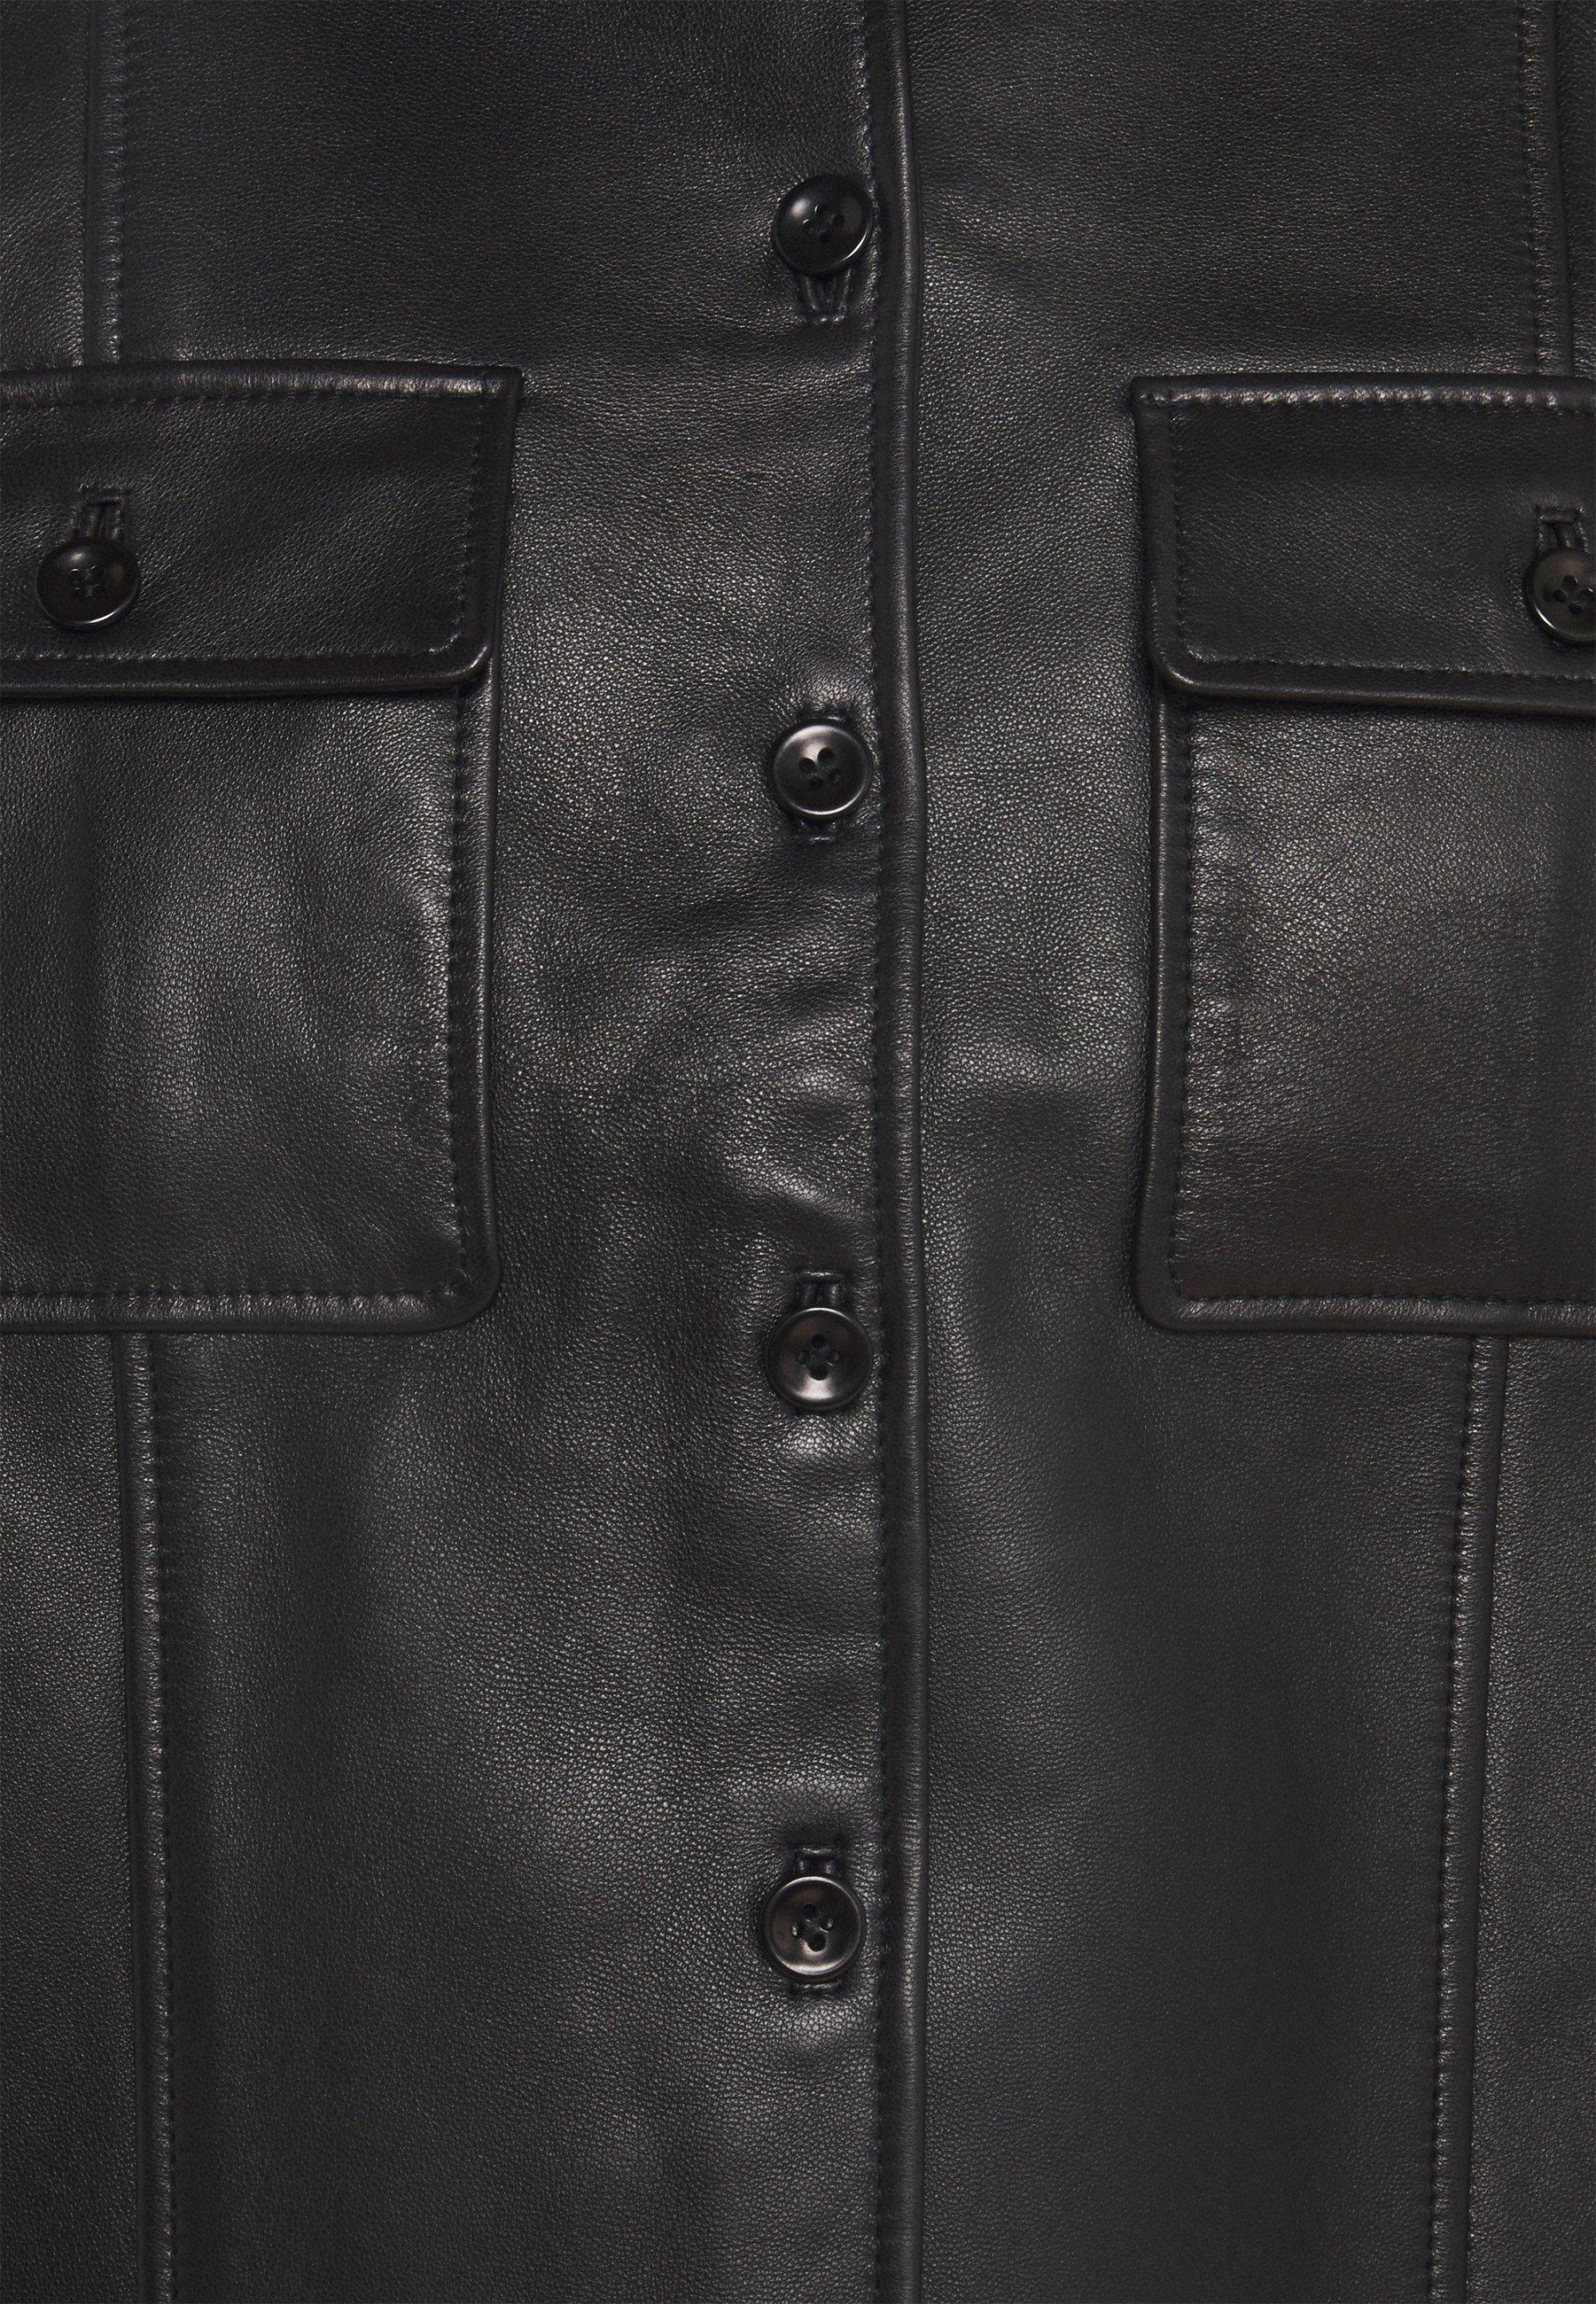 Proenza Schouler LIGHTWEIGHT COLLARED JACKET Lederjacke black/schwarz